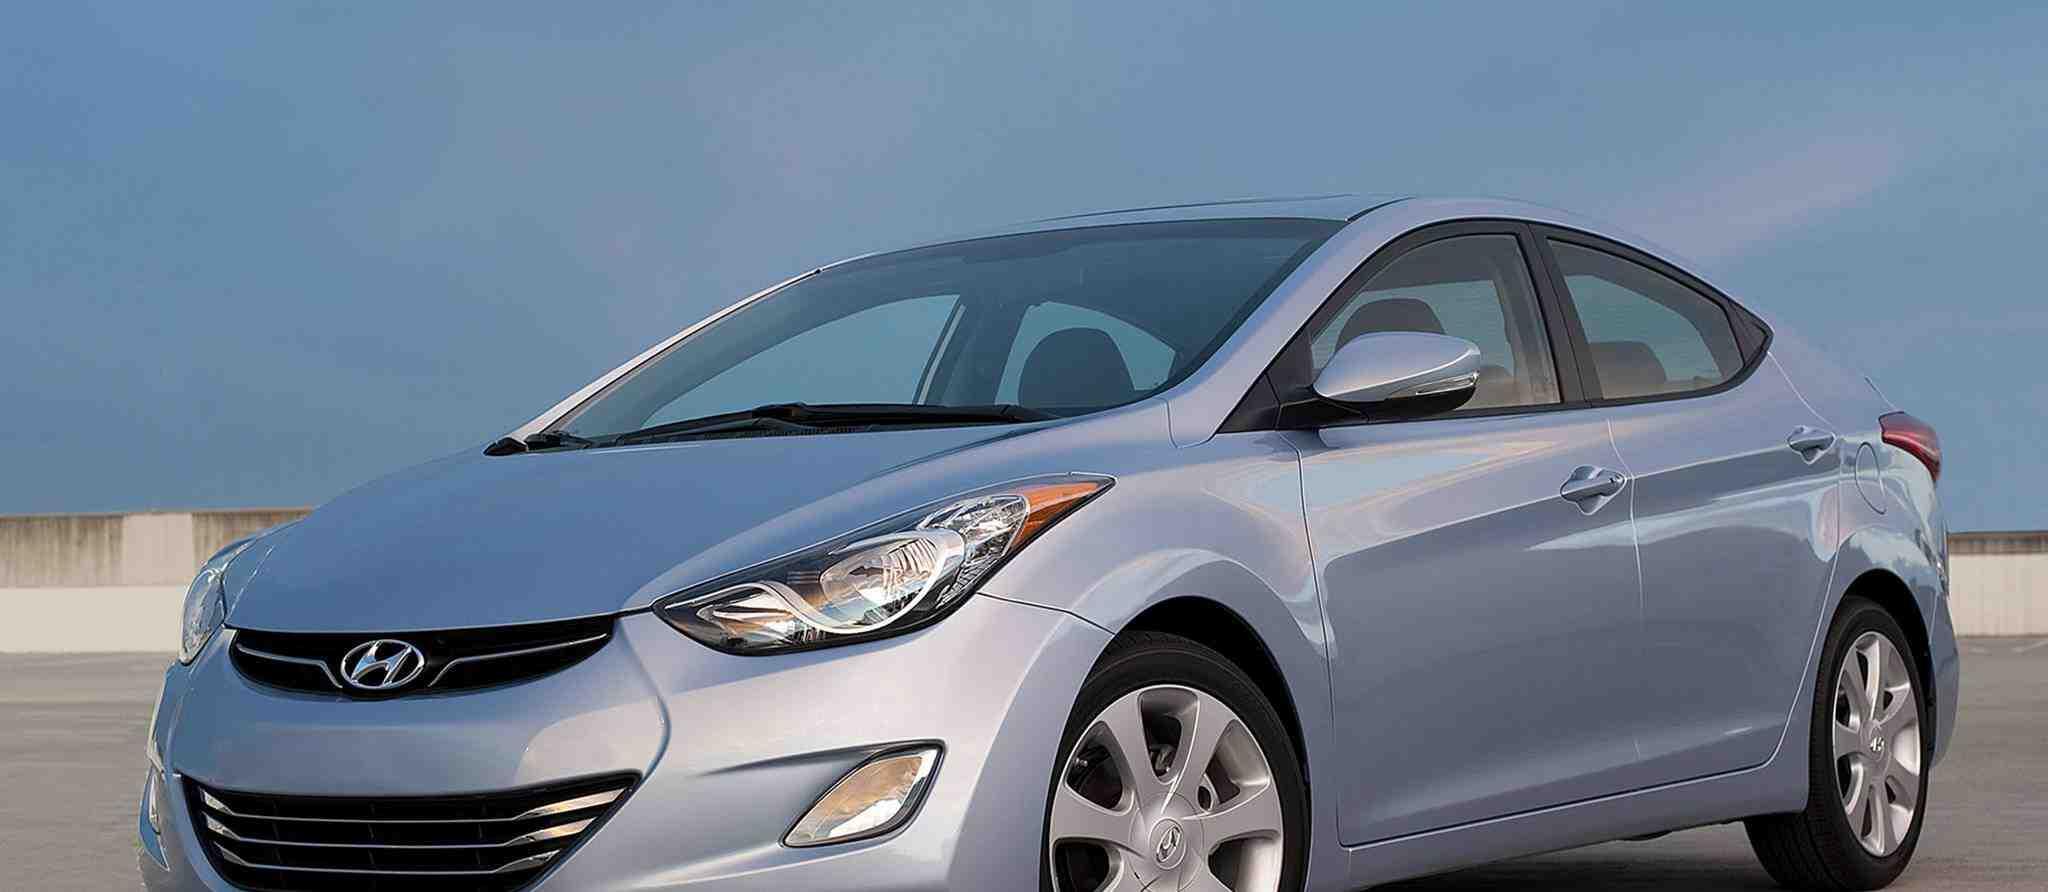 Quelle est l'origine de la marque Hyundai?